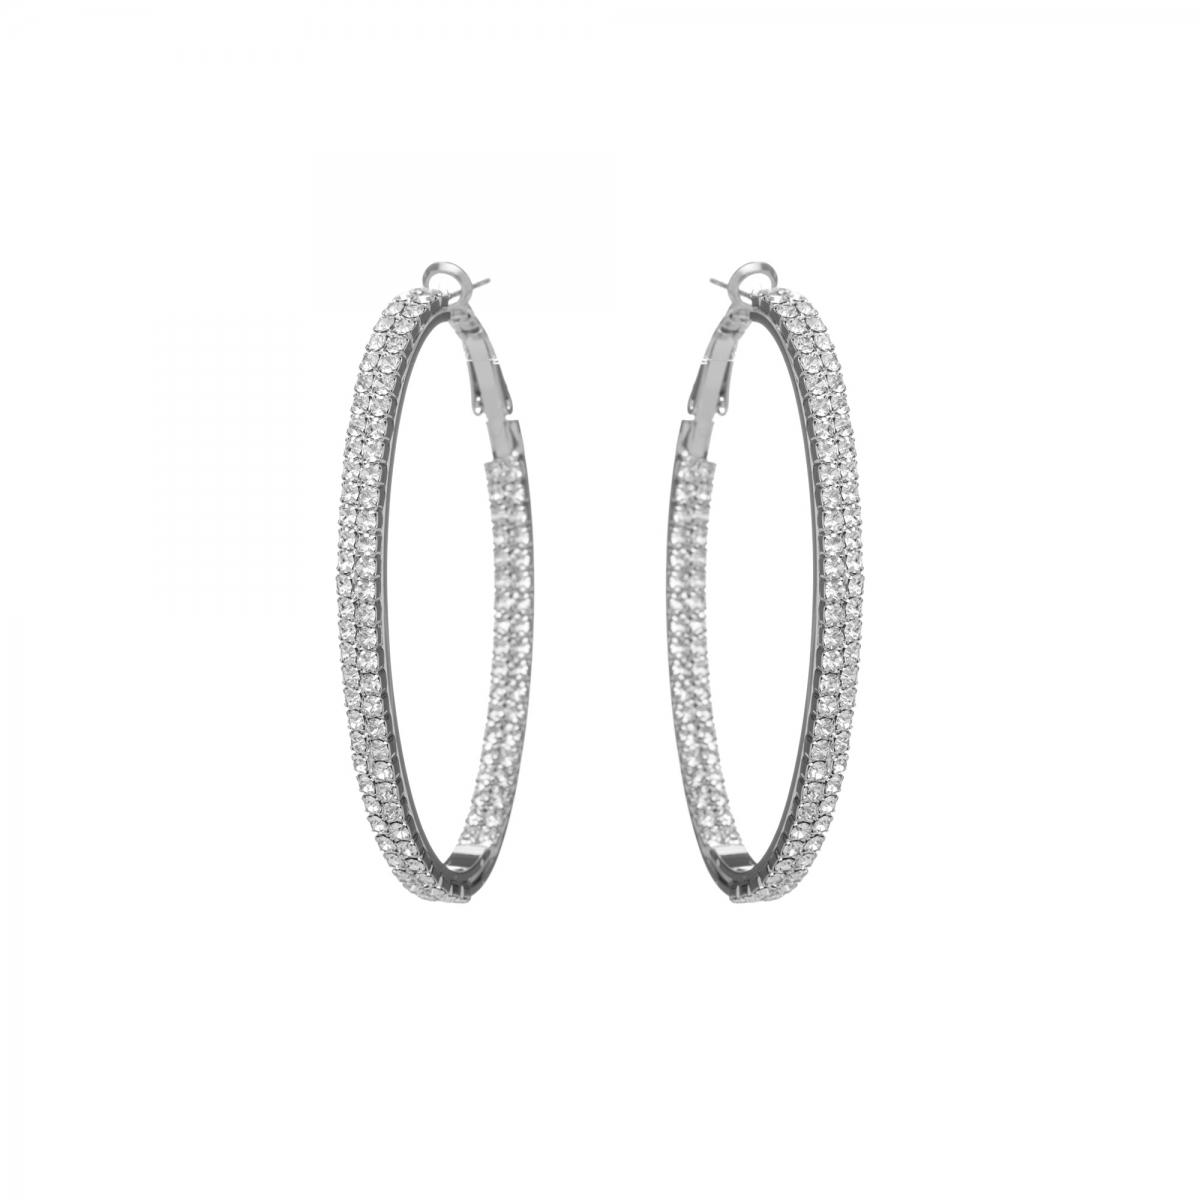 720ac2e8e Náušnice Oval Circle Swarovski Crystal Silver | Dorafashion.sk